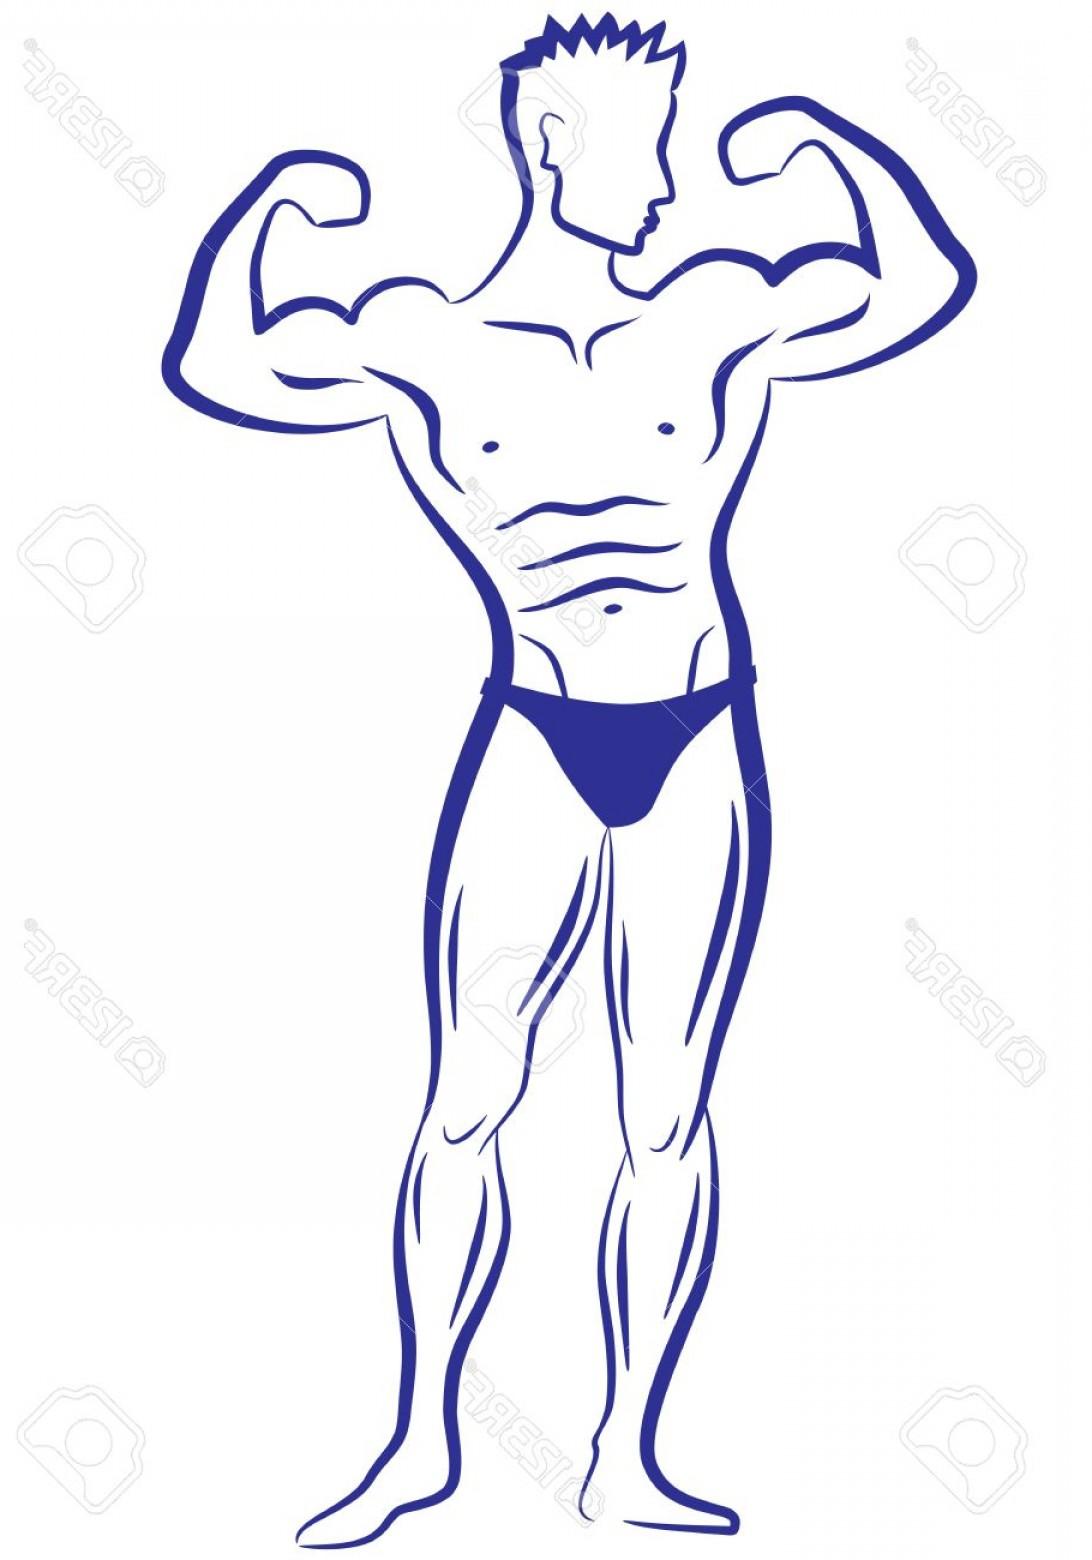 1092x1560 Photobody Builder Muscle Man Vector Sketch Shopatcloth